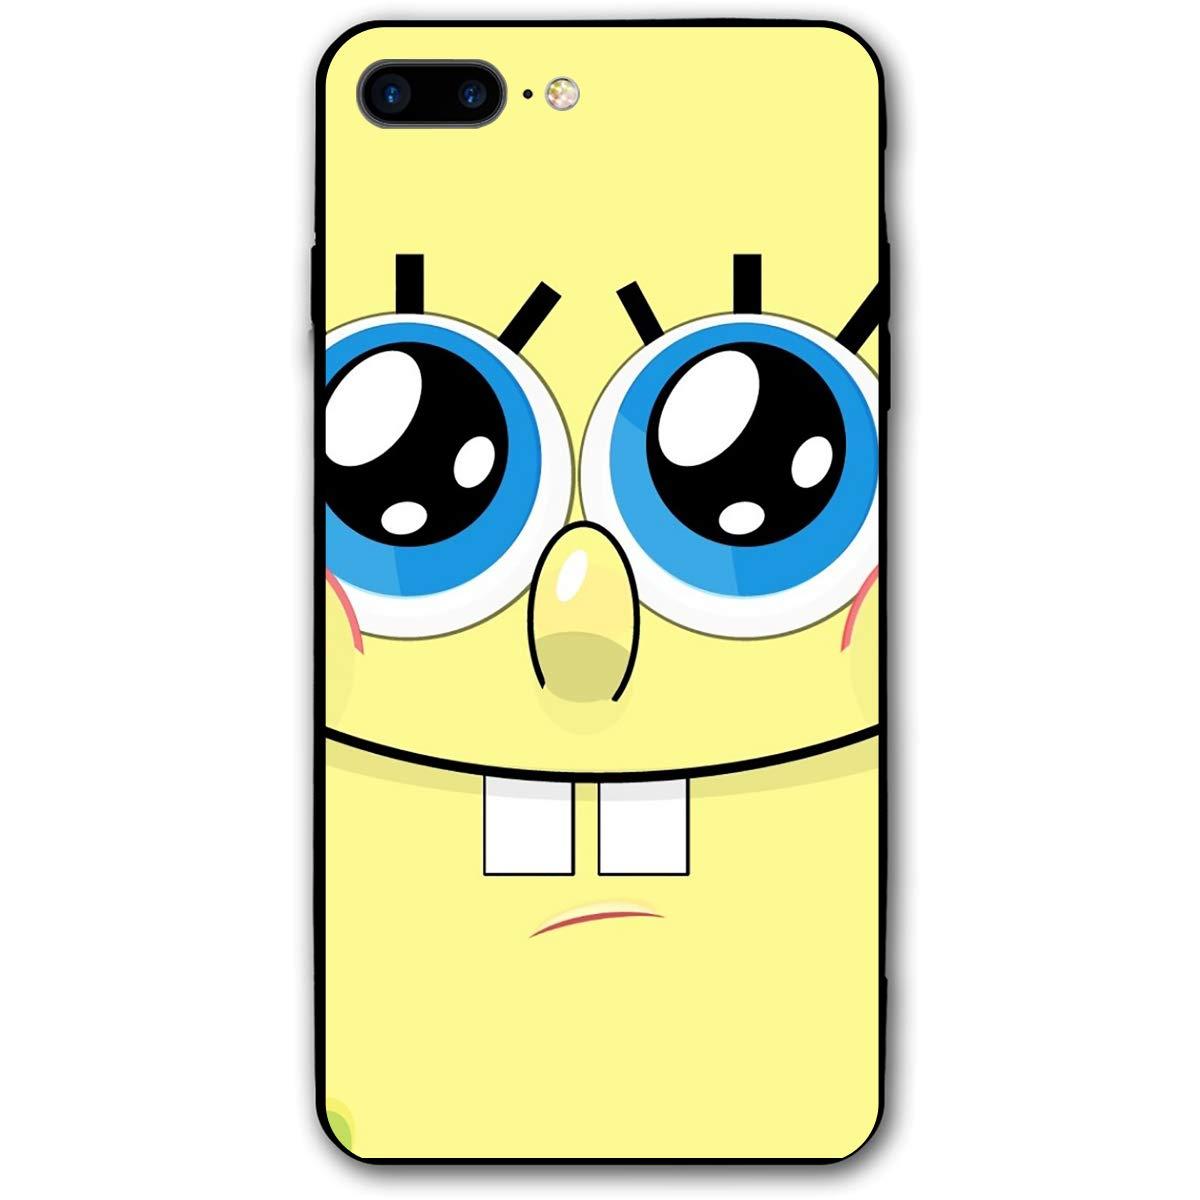 Amazoncom Wsxedc Custom Apple Iphone 78 Plus Case Cute Spongebob